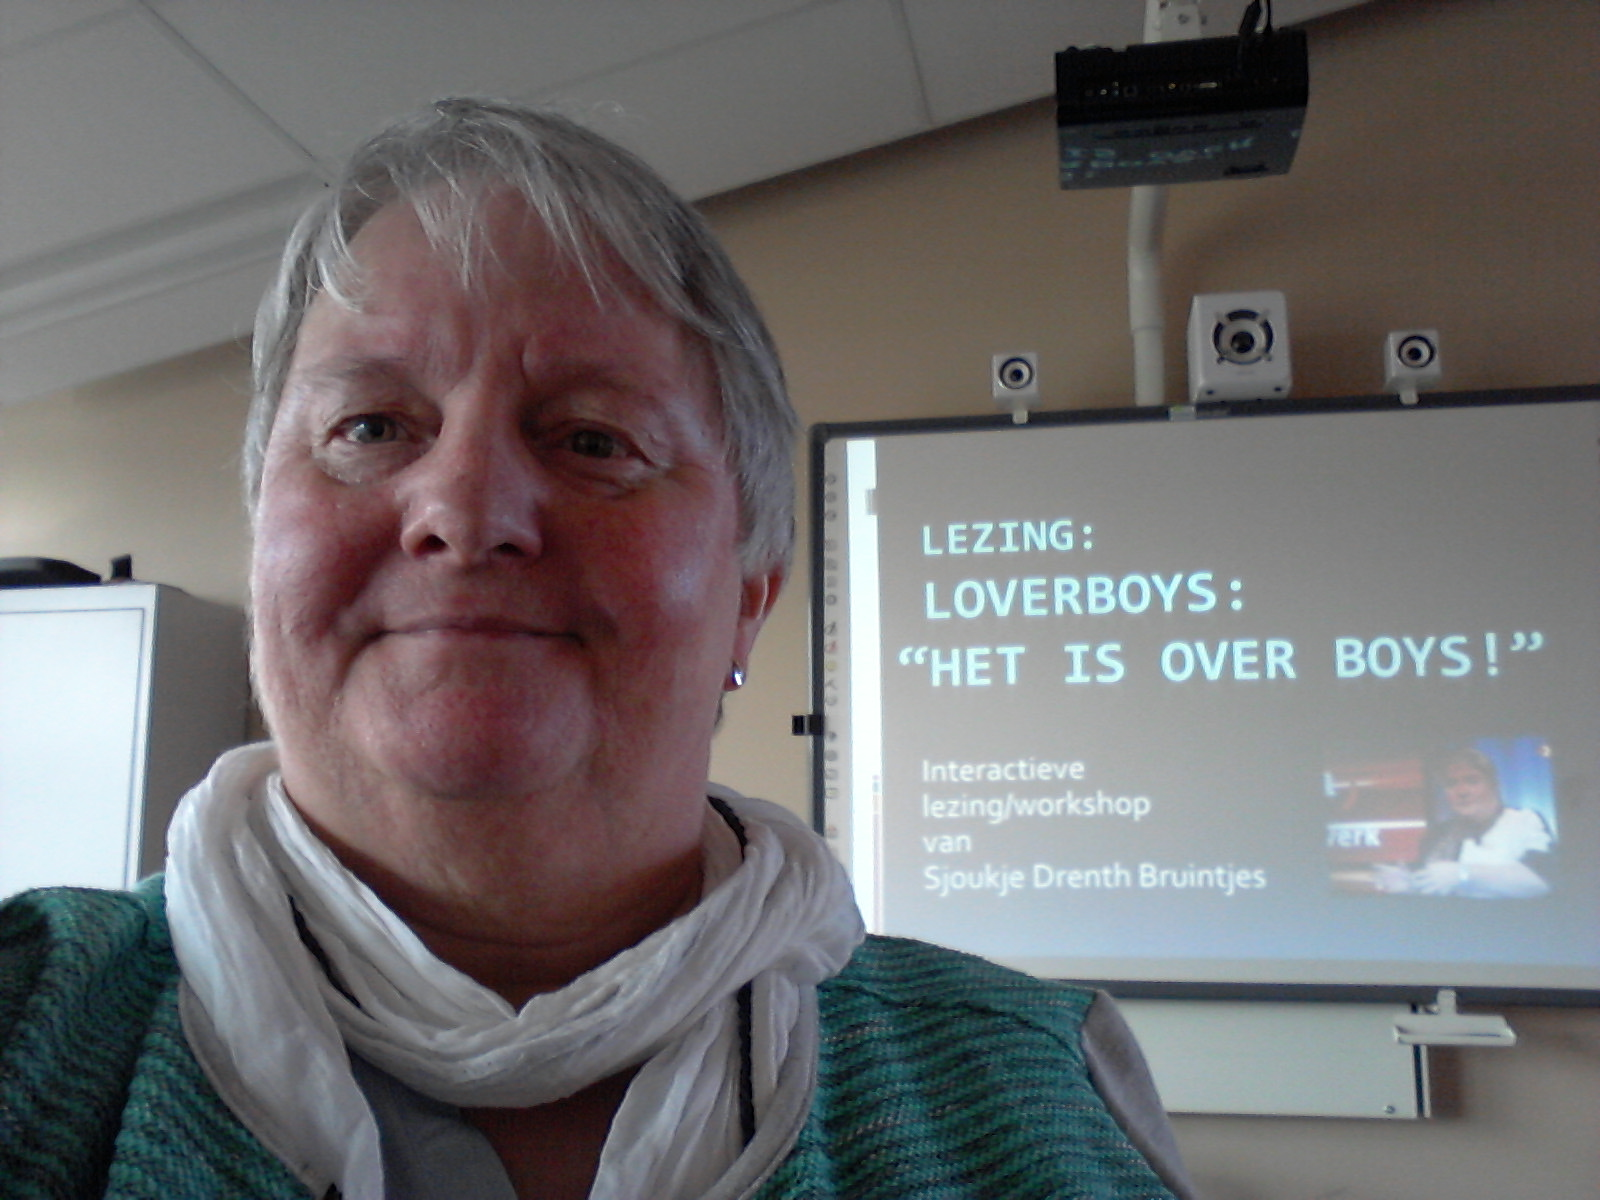 Sjoukje Drenth Bruintjes geeft interactieve lezing Loverboys Het is OVER boys.